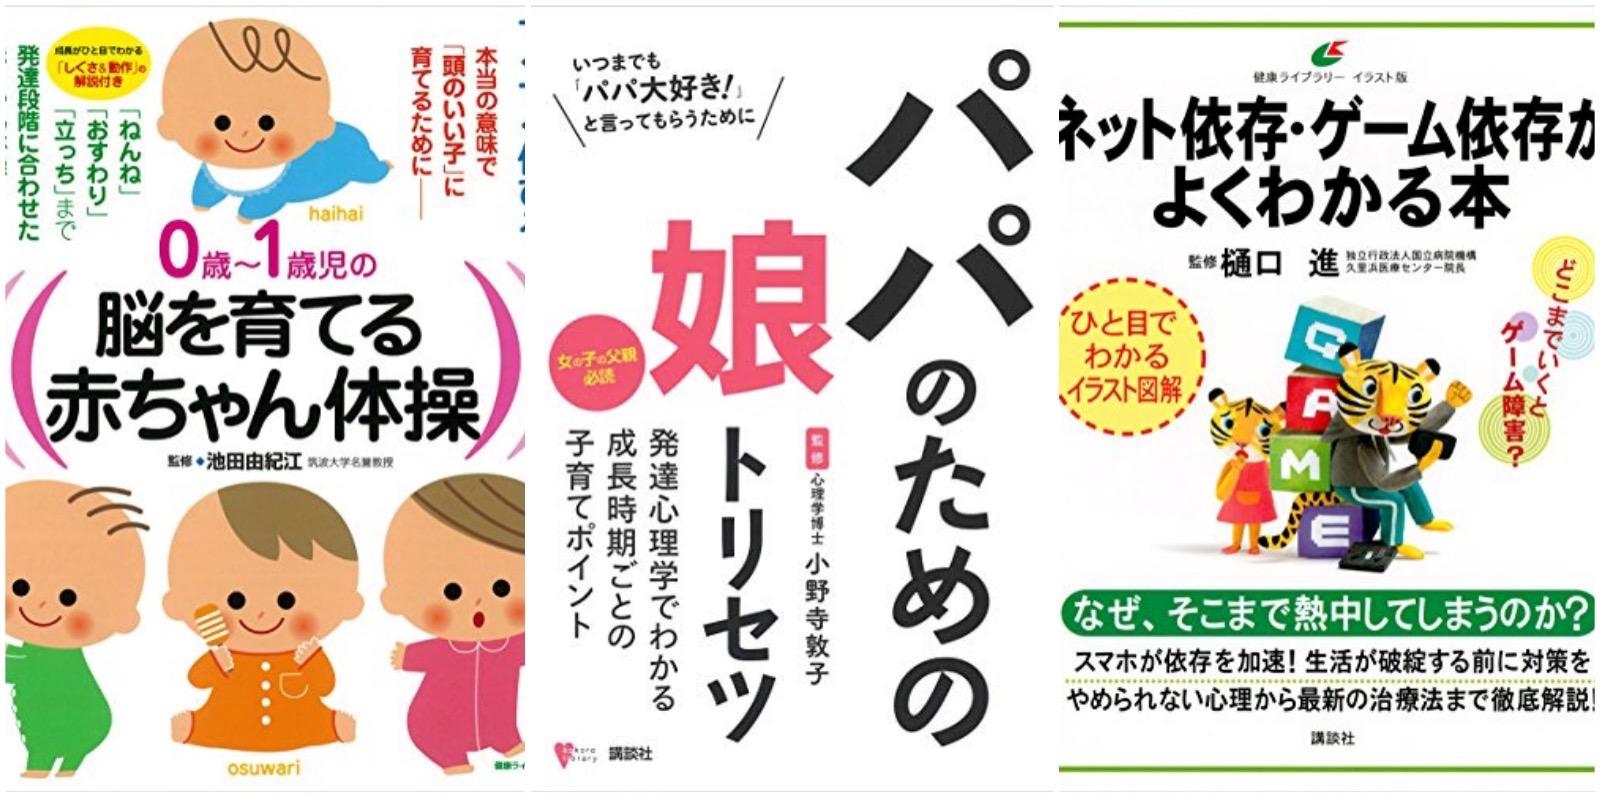 Childcare-kindle-sale.jpg